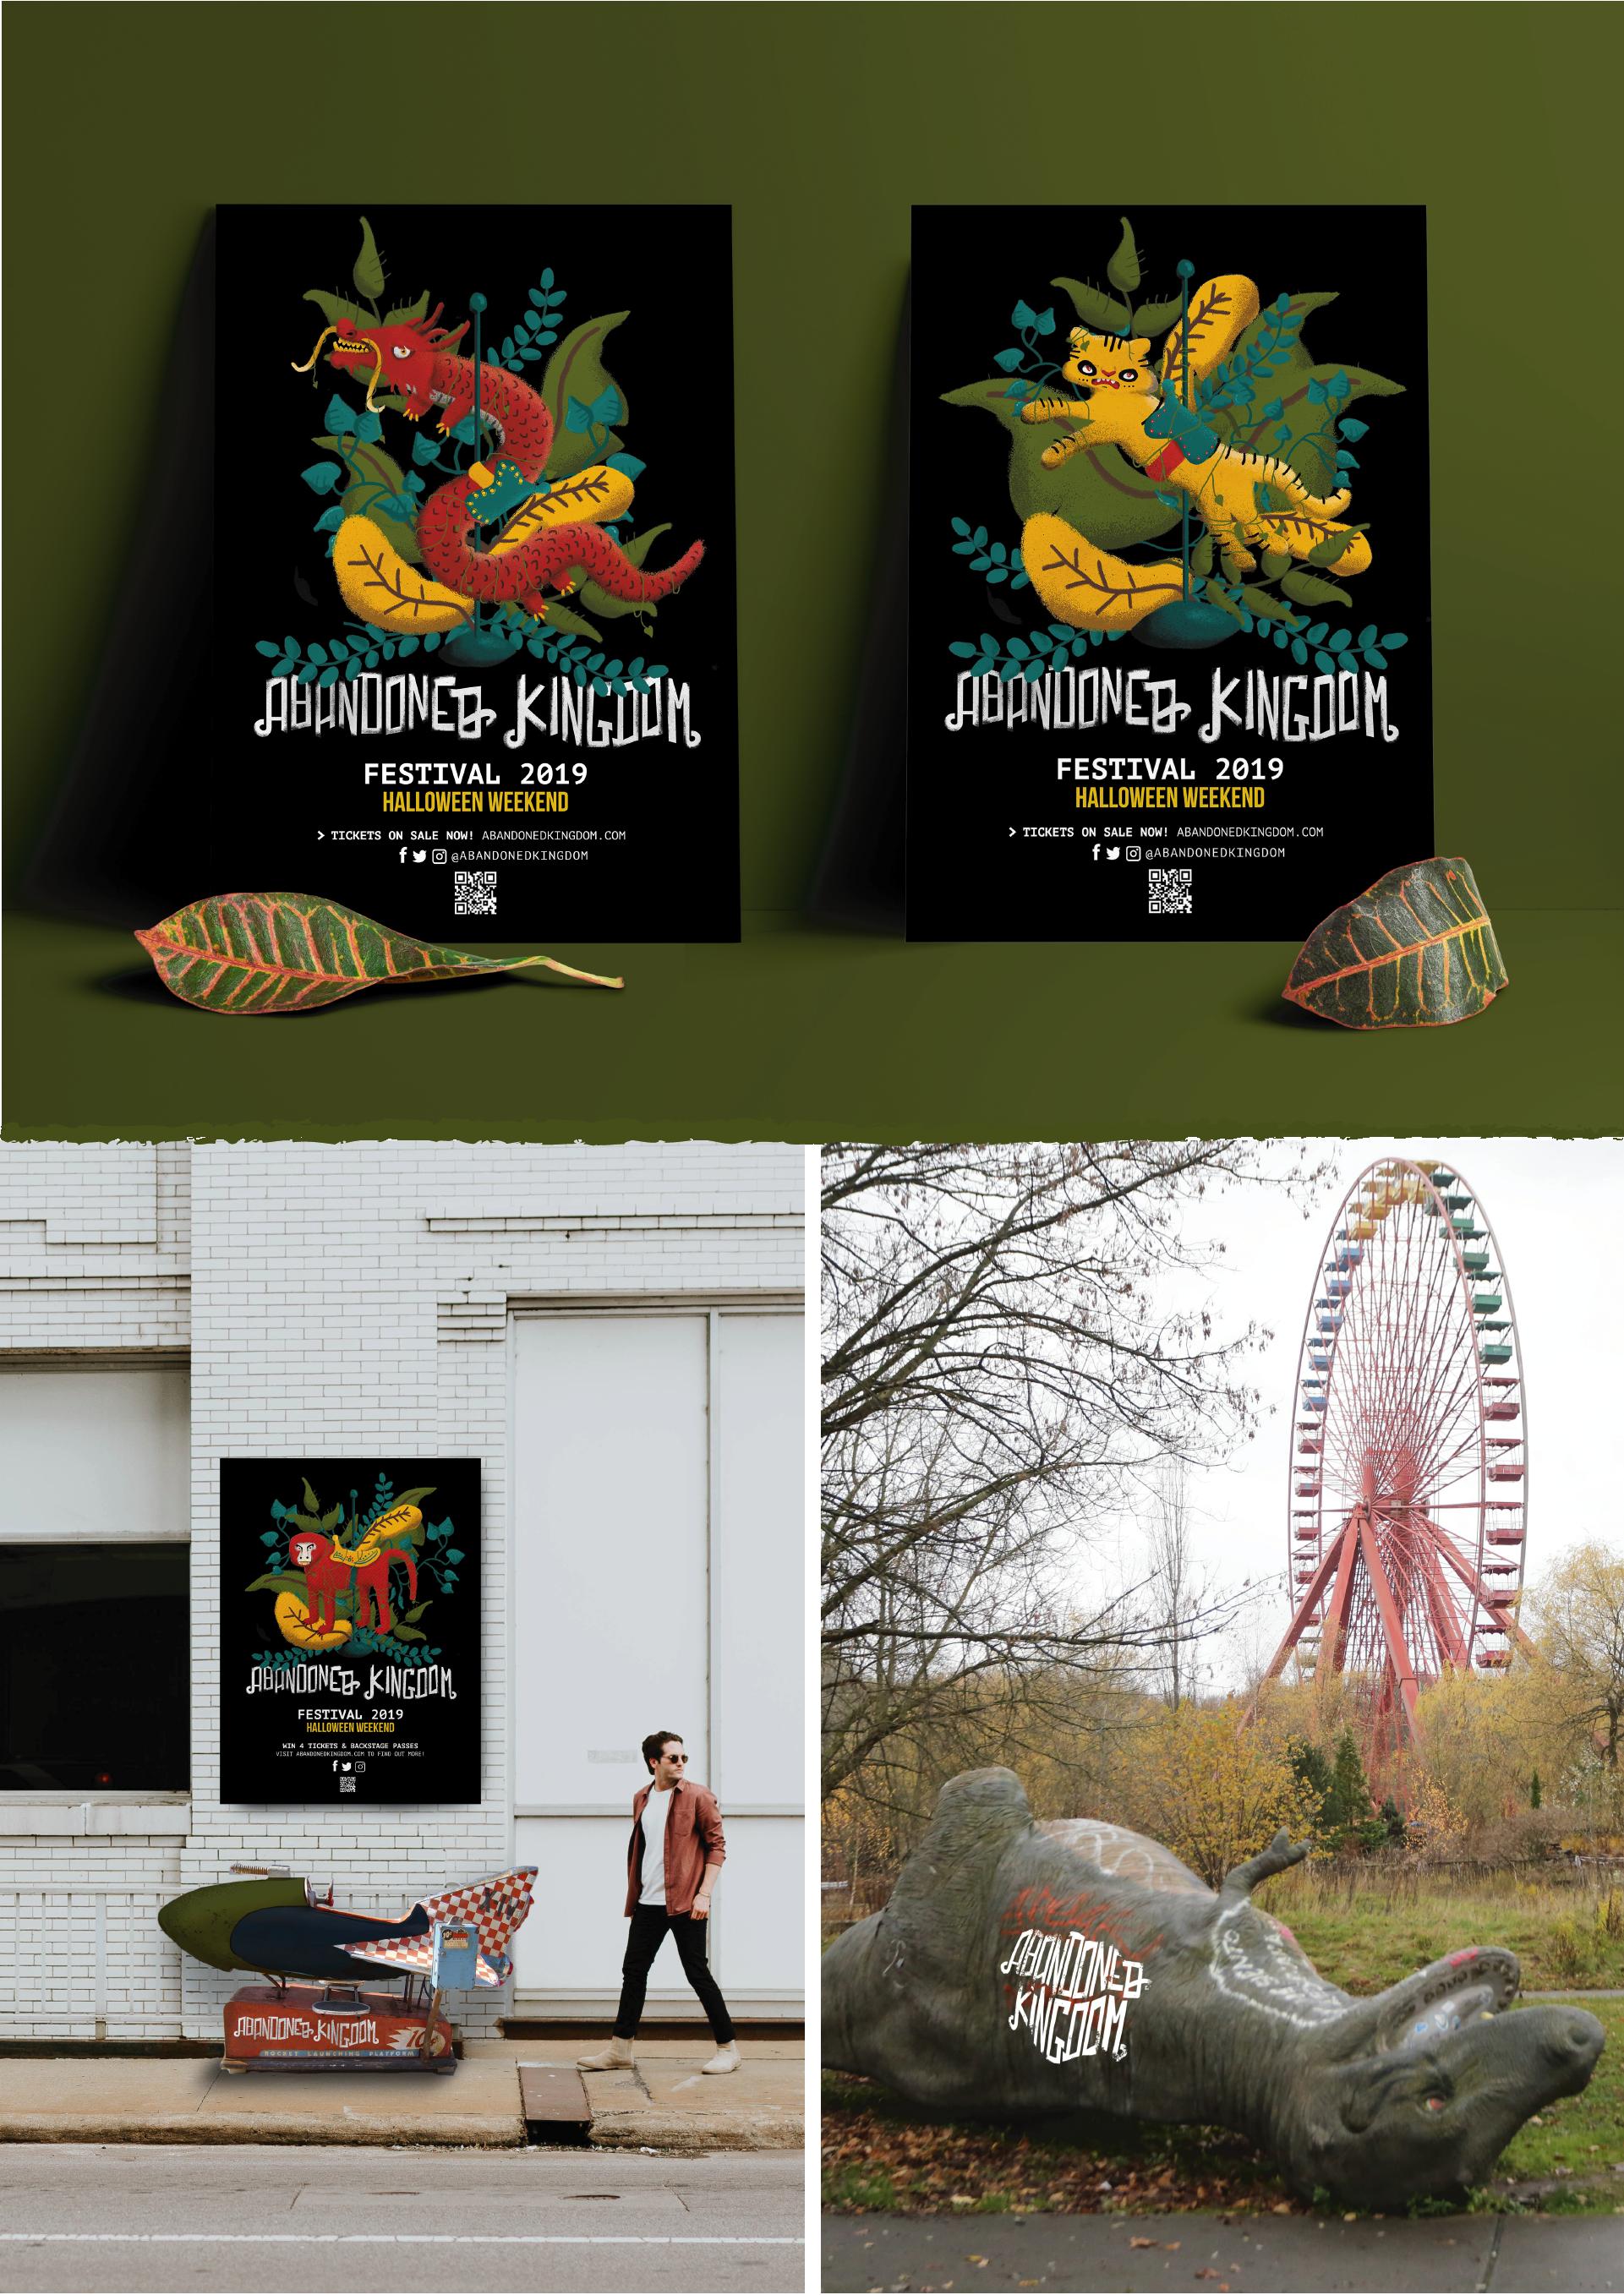 Abandoned Kingdom Festival_Web Layout_Version 2-01.png